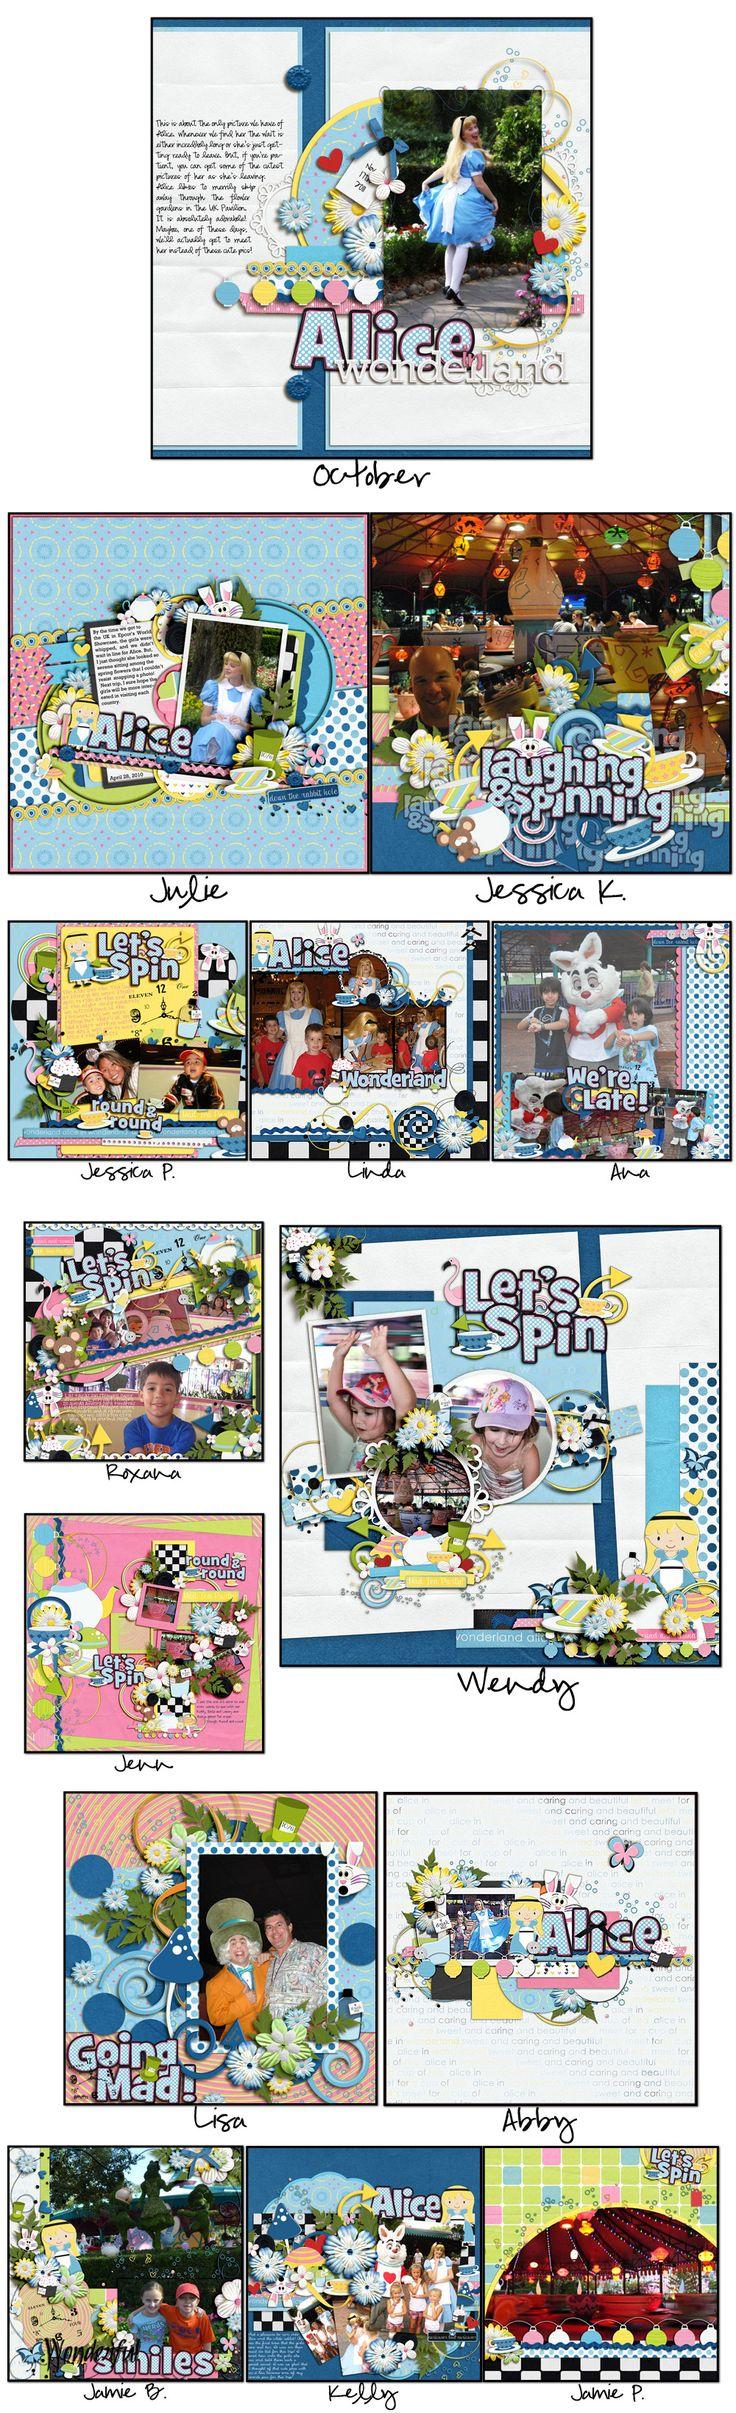 Disney scrapbook ideas - Disney Scrapbook Digital Scrapbook Scrapbooking Ideas Scrapbook Layouts Magic Kingdom Disney Characters Disney Magic Alice In Wonderland Disneyland